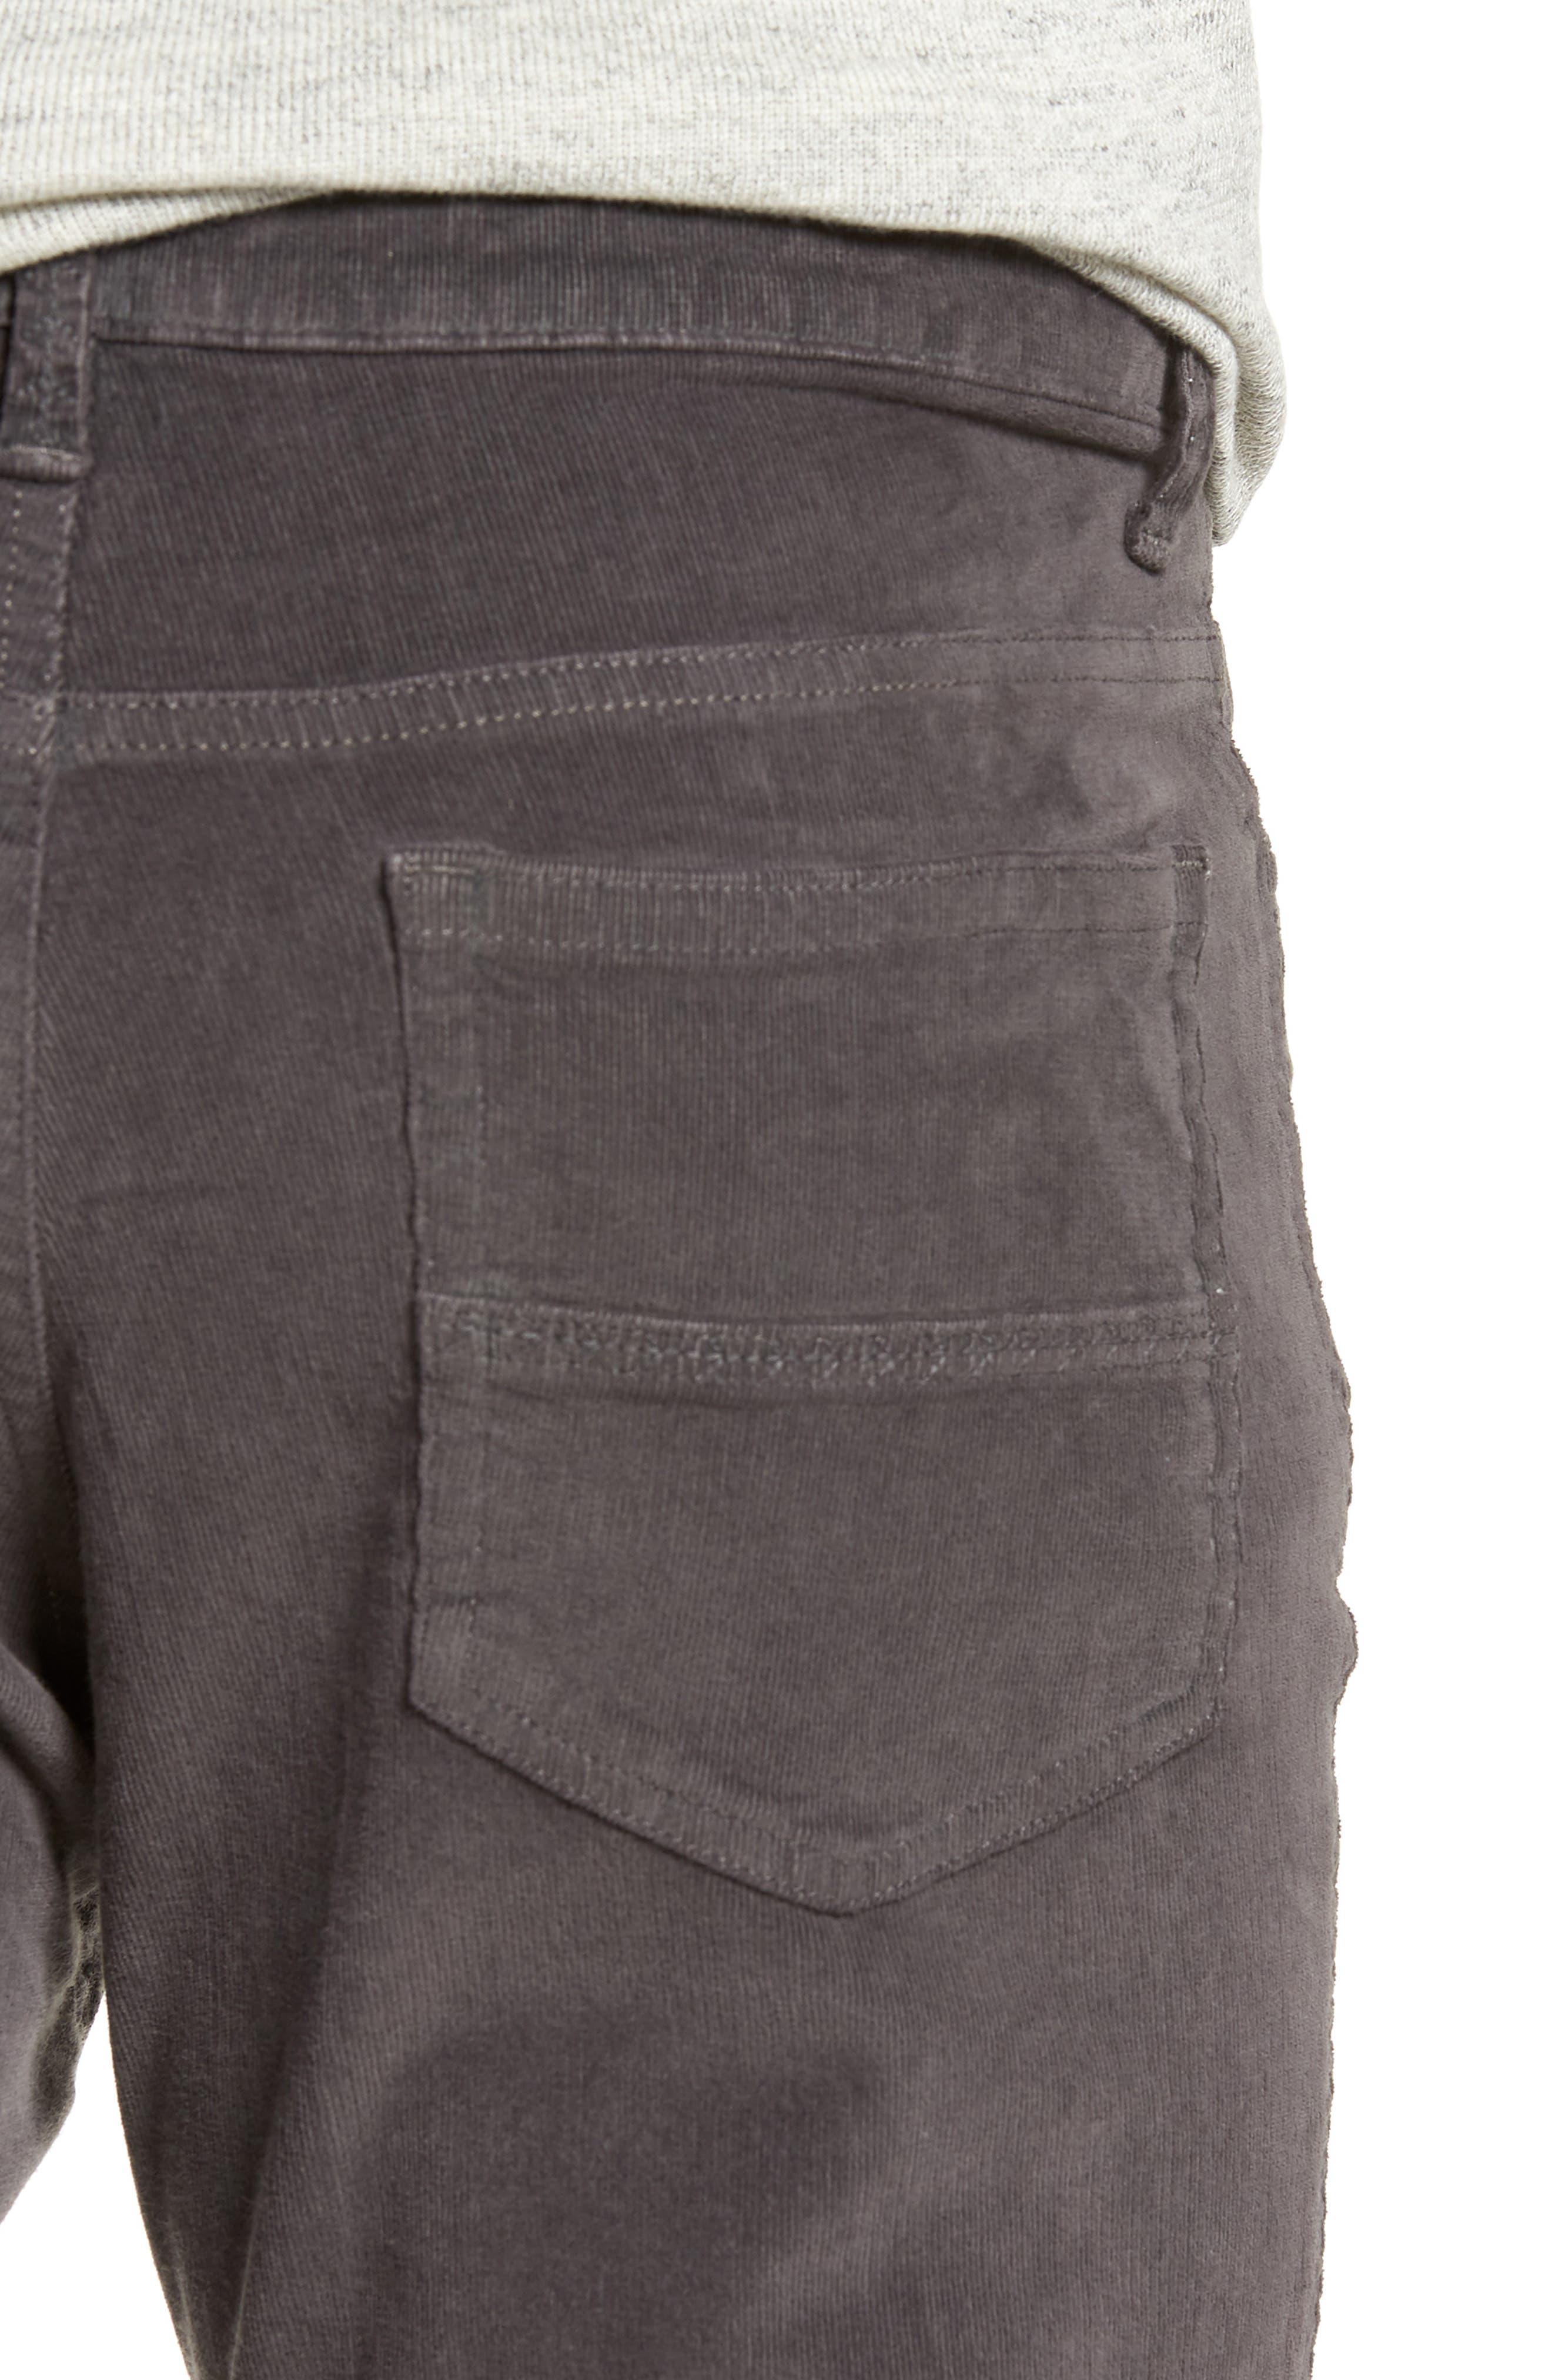 VINTAGE 1946,                             Modern Fit Stretch Corduroy Pants,                             Alternate thumbnail 4, color,                             CHARCOAL